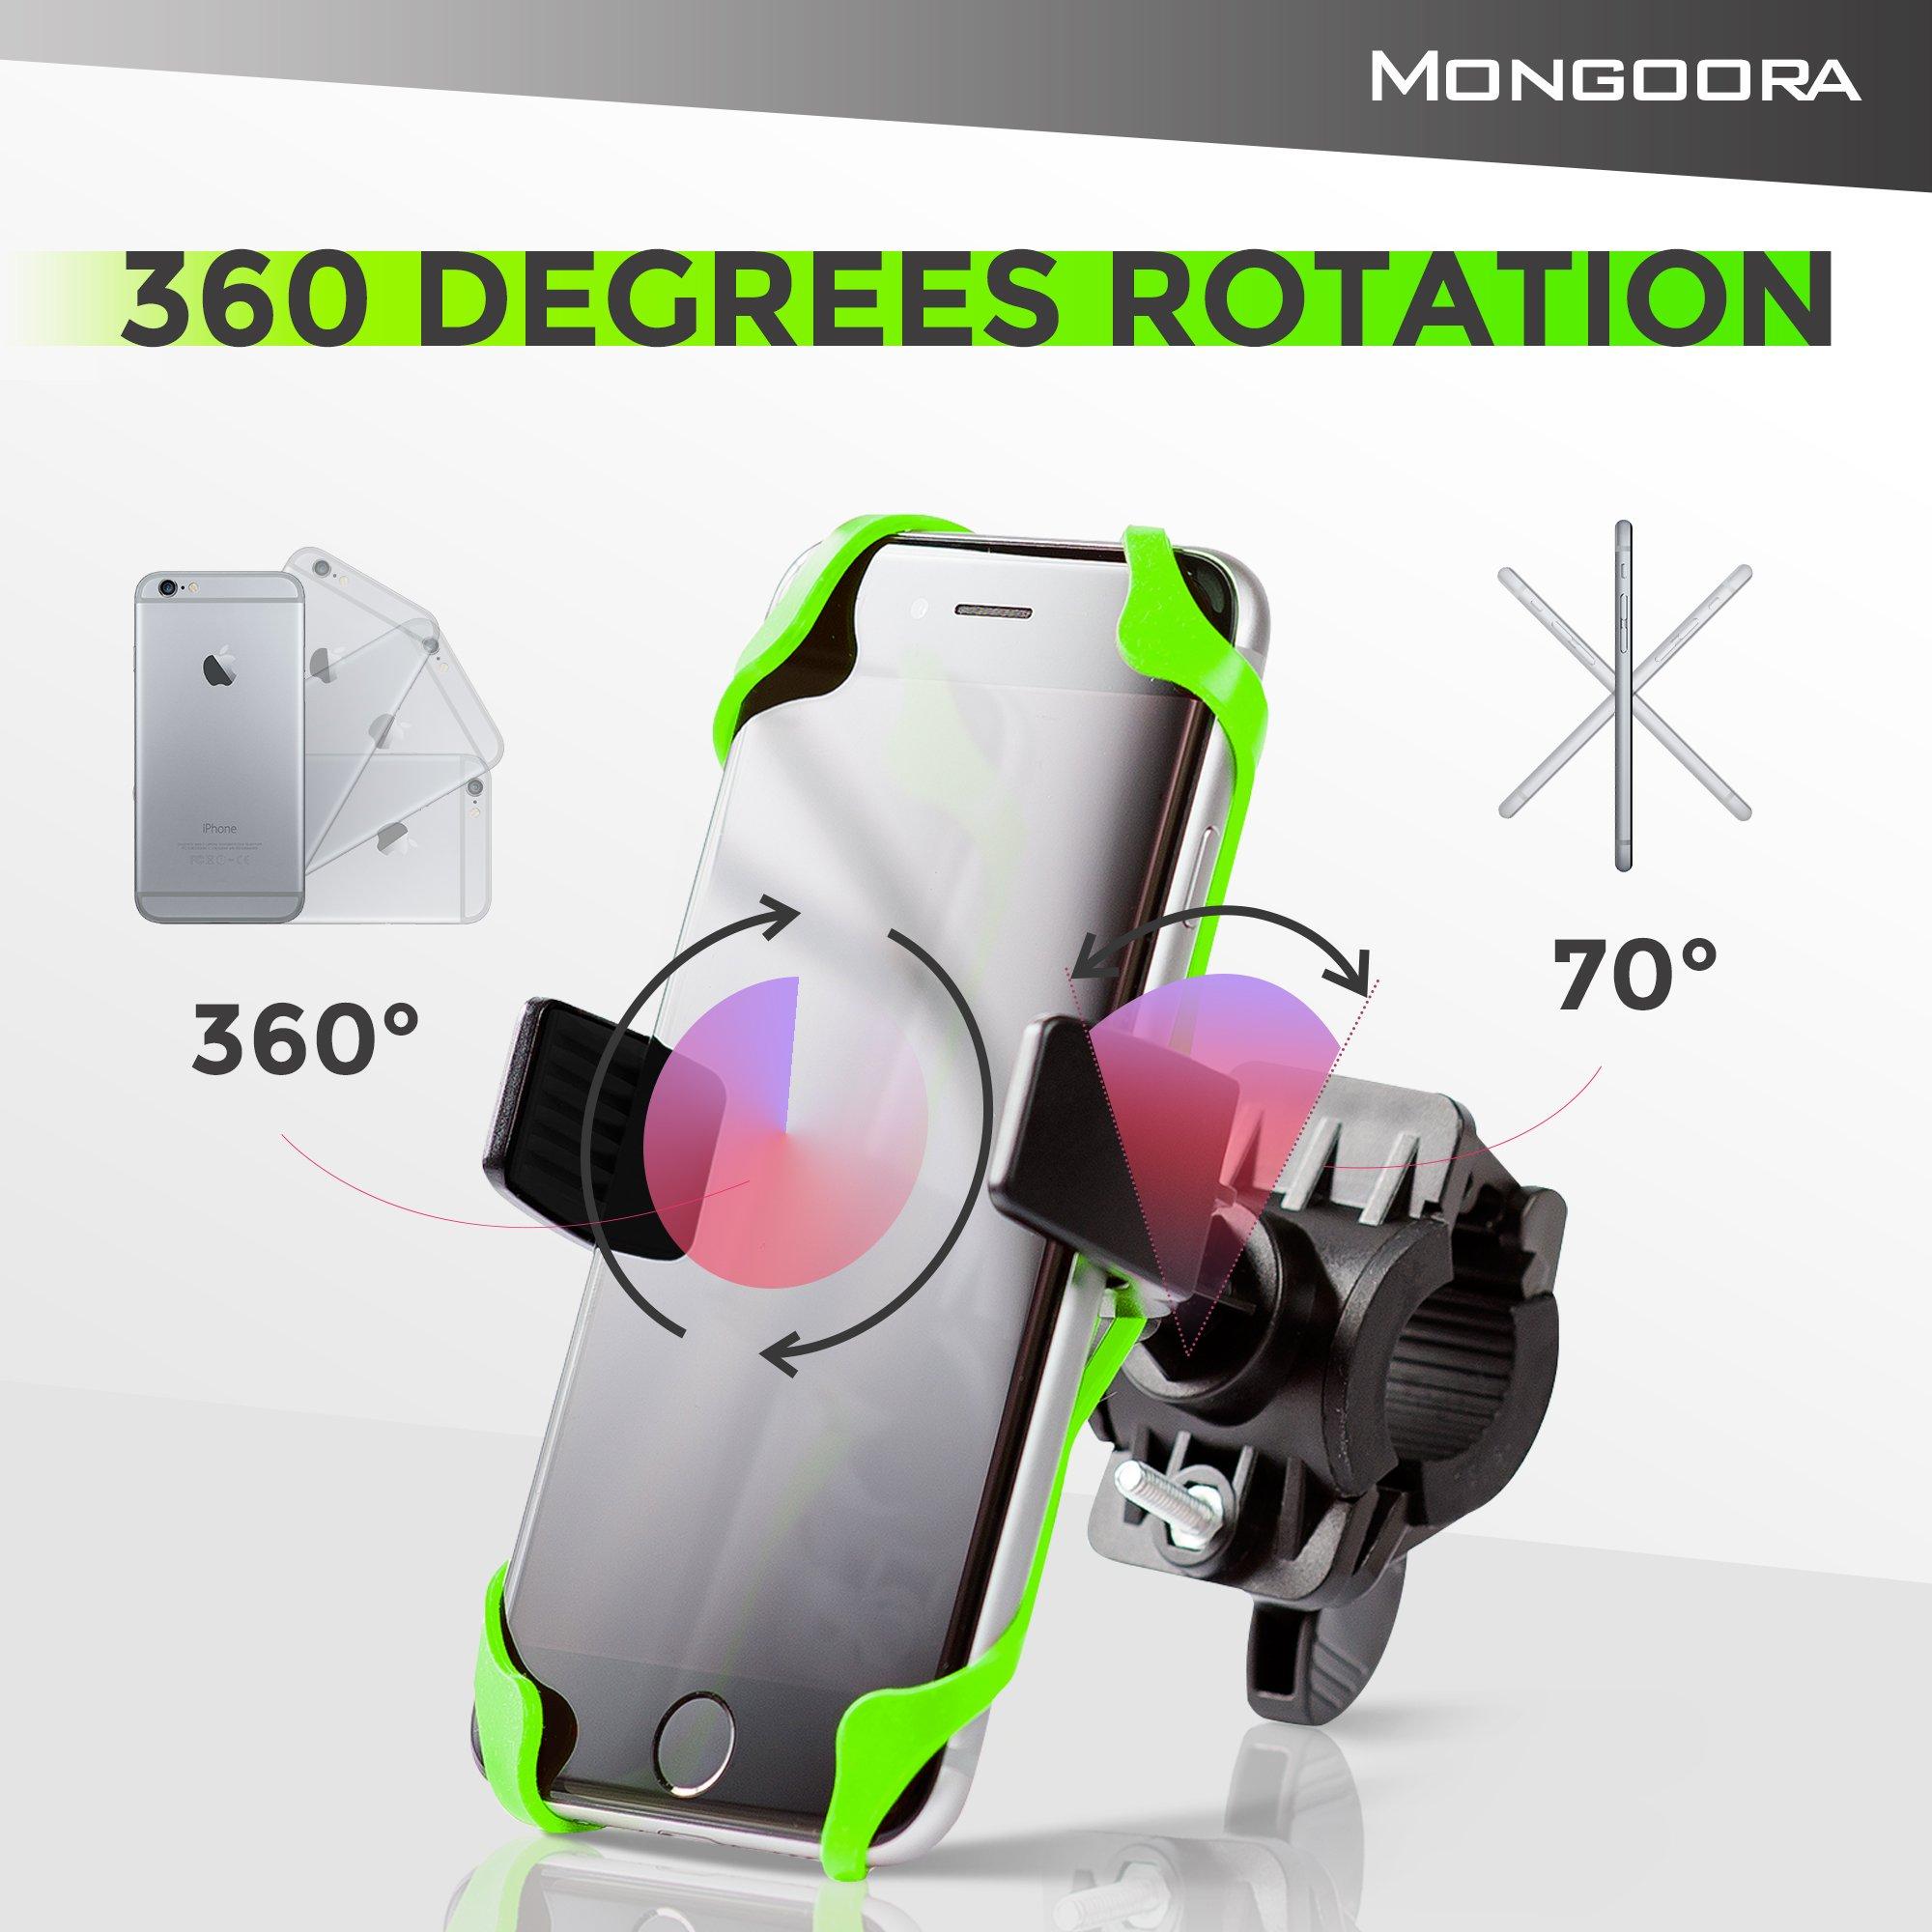 Bike Phone Mount for any Smart Phone: iPhone X 8 7 6 5 plus Samsung Galaxy S9 S8 S7 S7 S6 S5 S4 Edge, Nexus, Nokia, LG. Motorcycle, Bicycle Phone Mount. Mountain Bike Mount. Bike Accessories. by Mongoora (Image #9)